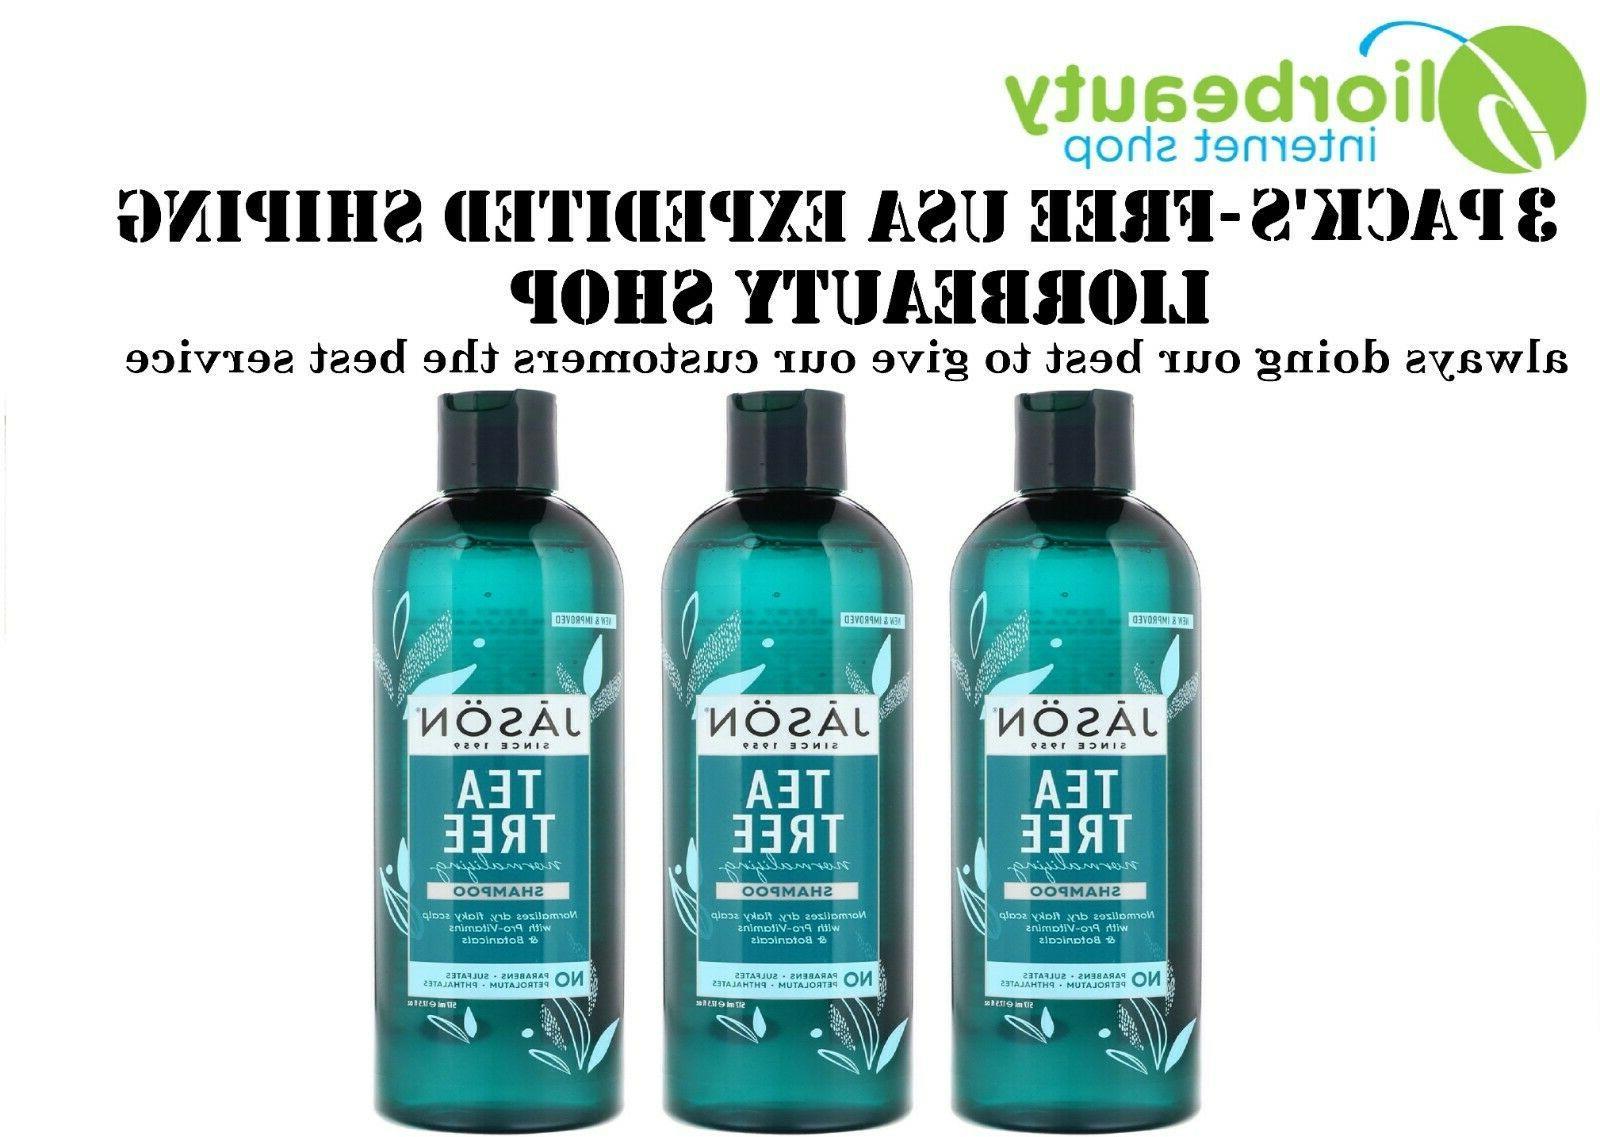 JASON NATURAL PRODUCTS SHAMPOO,T TREE OIL THERPY 17.5 OZ 1-E